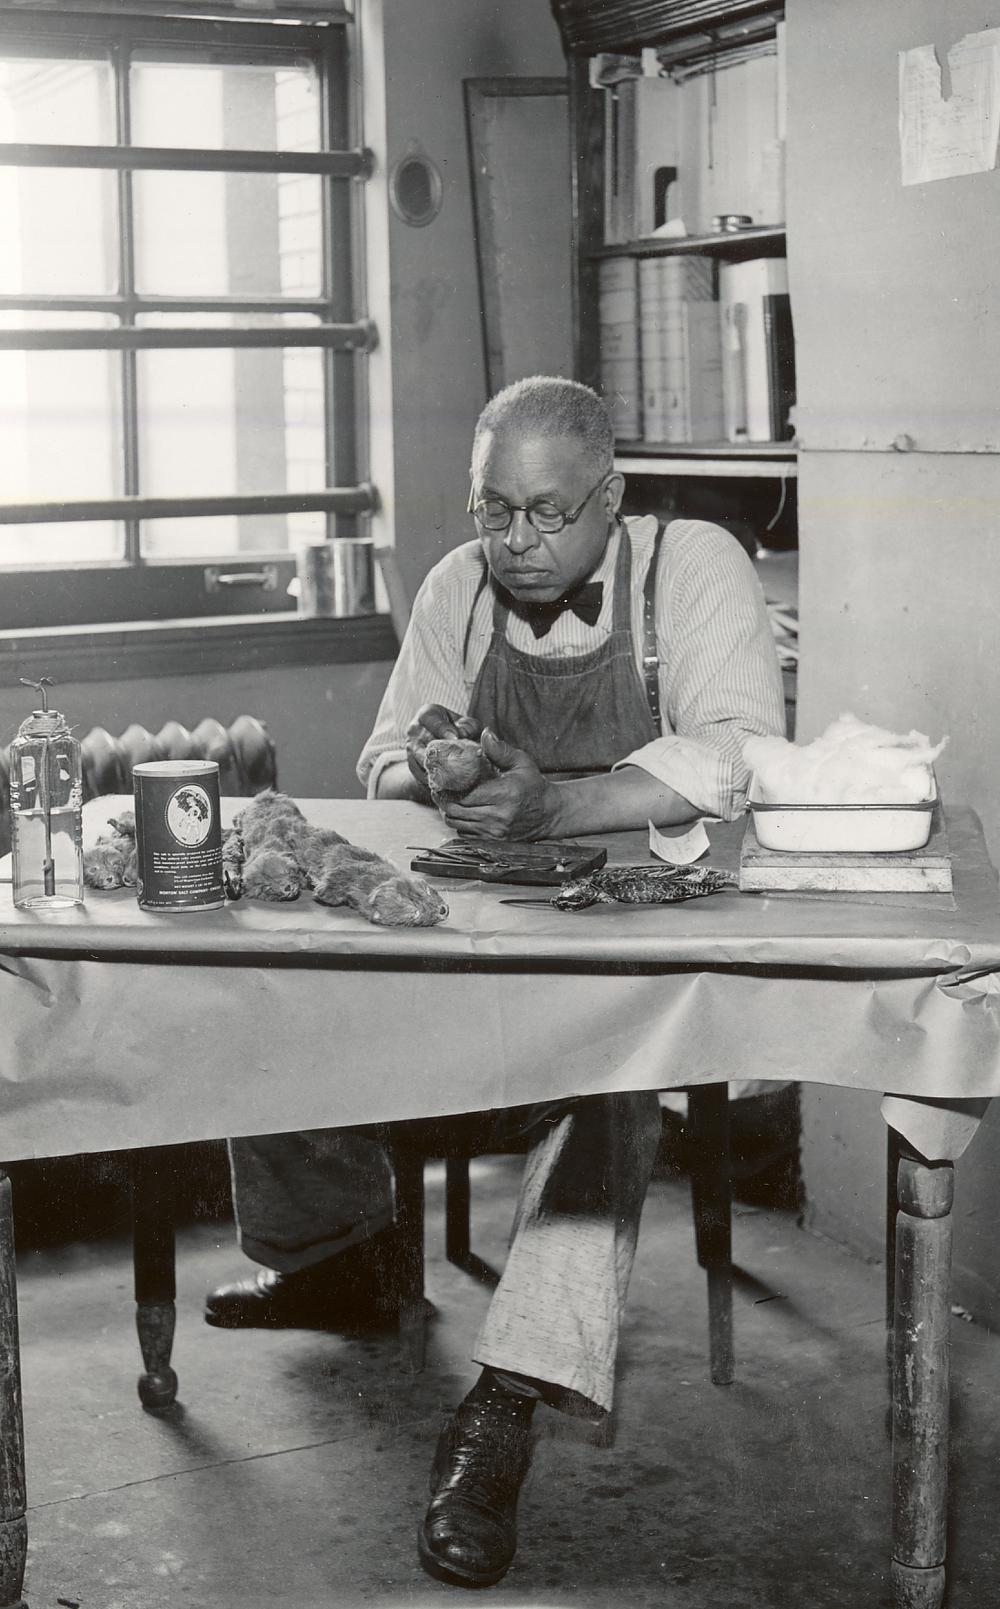 Robert Taylor of the exhibit construction team, Centennial Building circa 1950s. Photo courtesy Illinois State Museum.